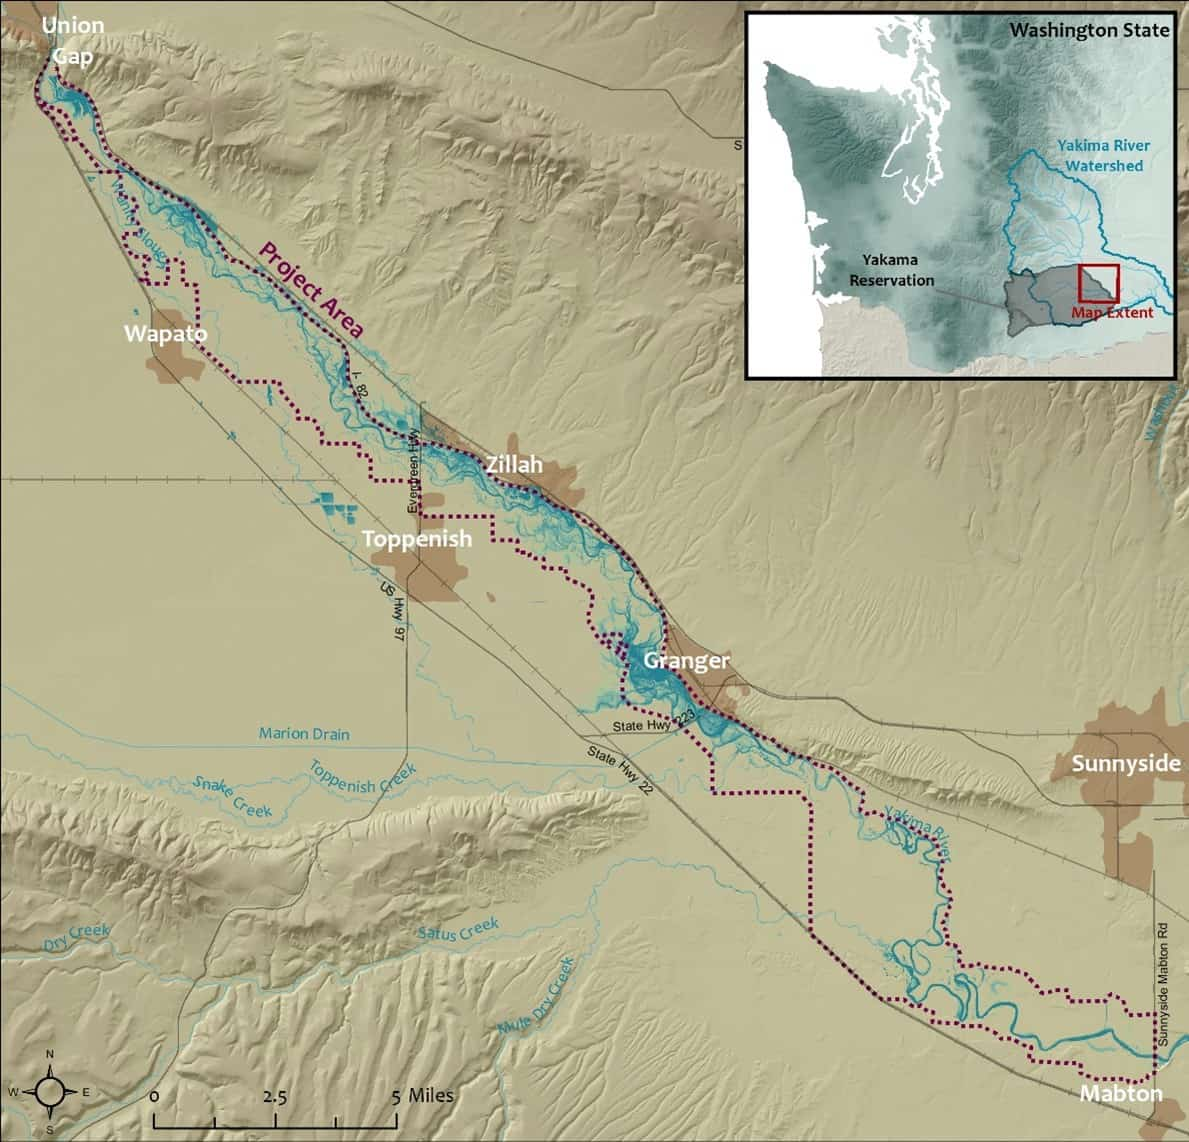 Yakima River Wapato Reach Riparian Restoration